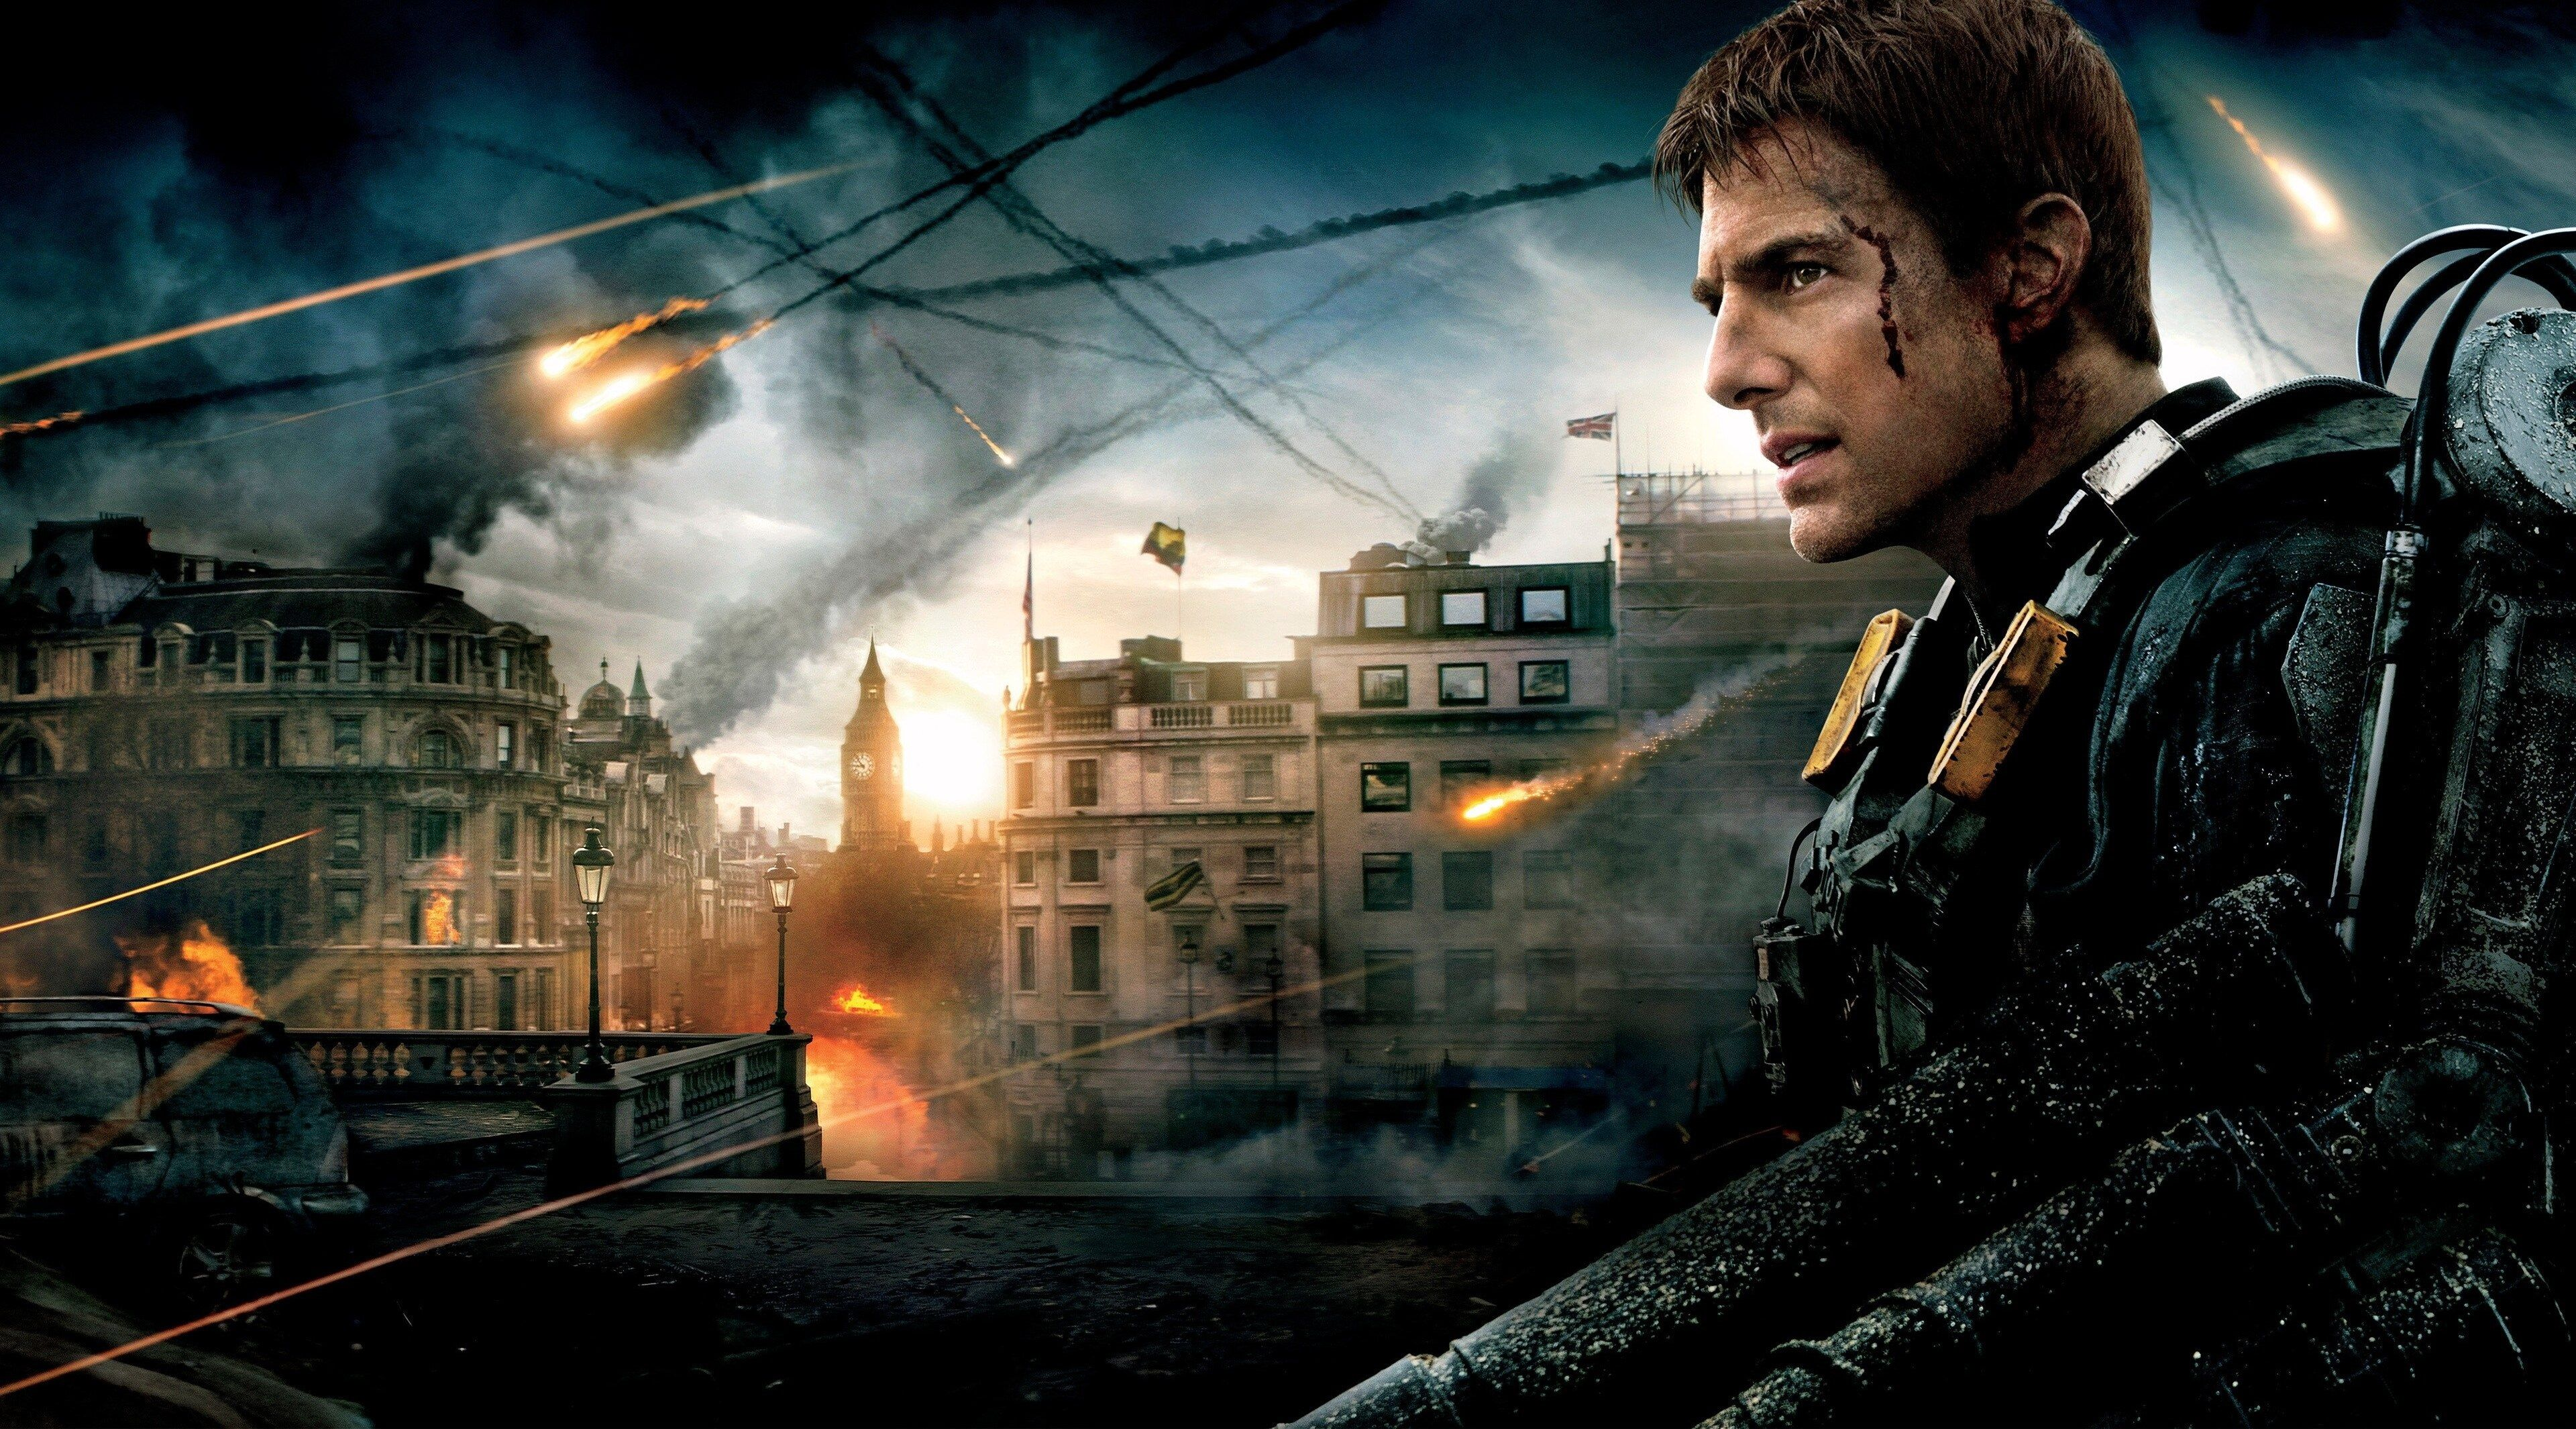 3840x2130 Edge Of Tomorrow 4k Awesome Wallpaper Edge Of Tomorrow Tom Cruise Tom Cruise Movies